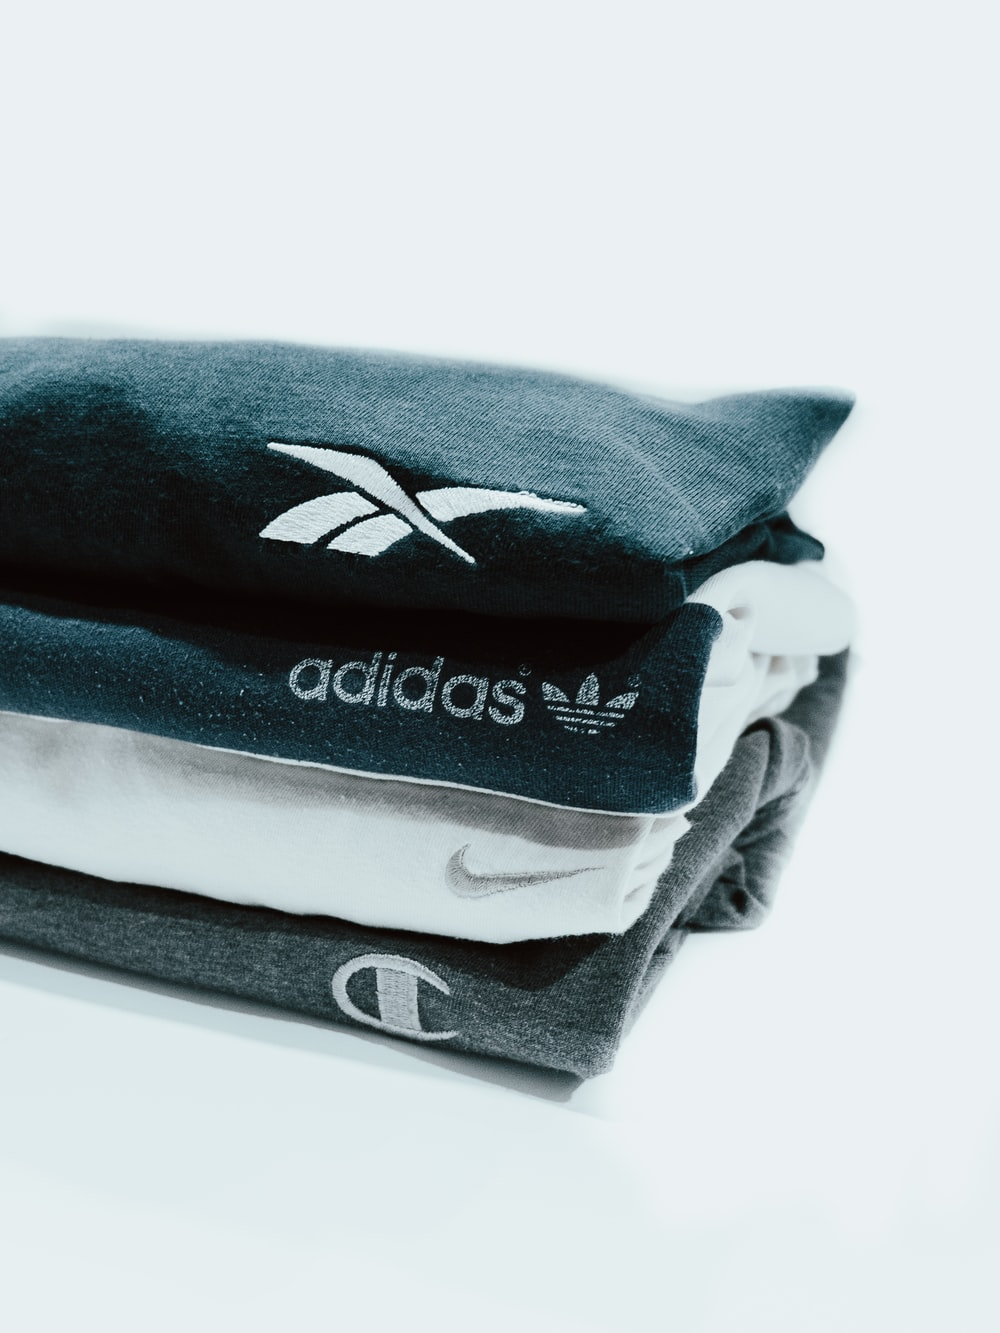 blue and white puma textile